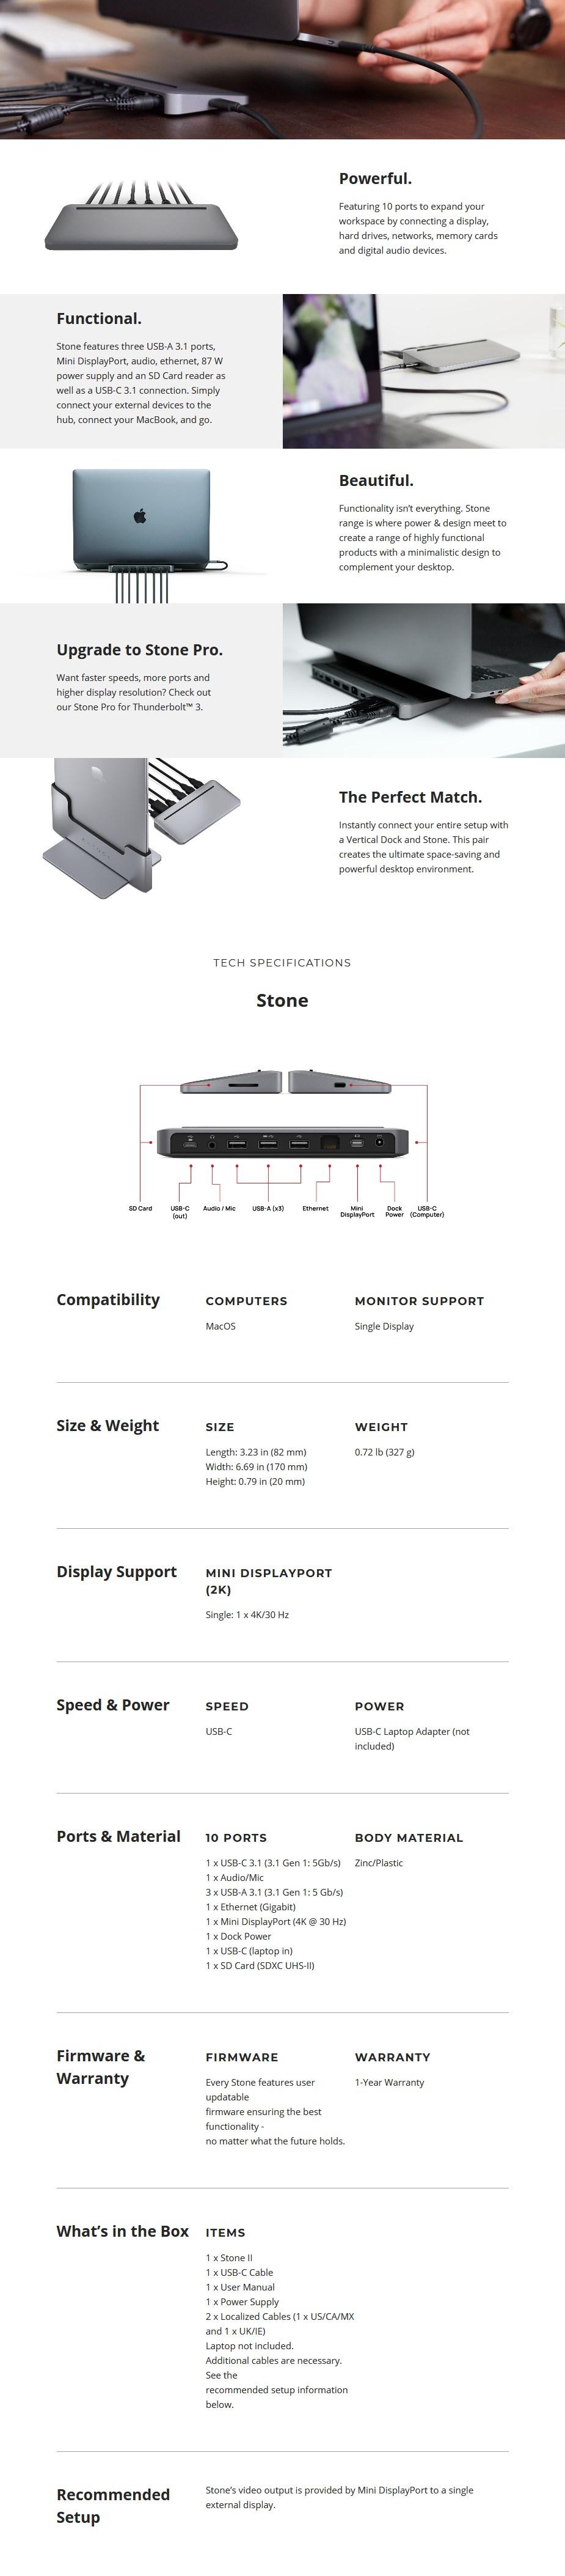 Brydge Stone USB-C Multi-Port Desktop Hub - For Apple MacBooks - Overview 1